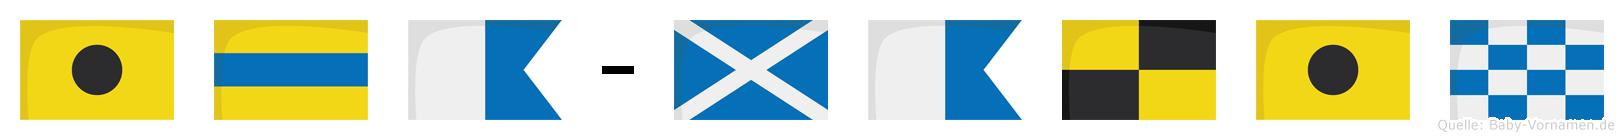 Ida-Malin im Flaggenalphabet